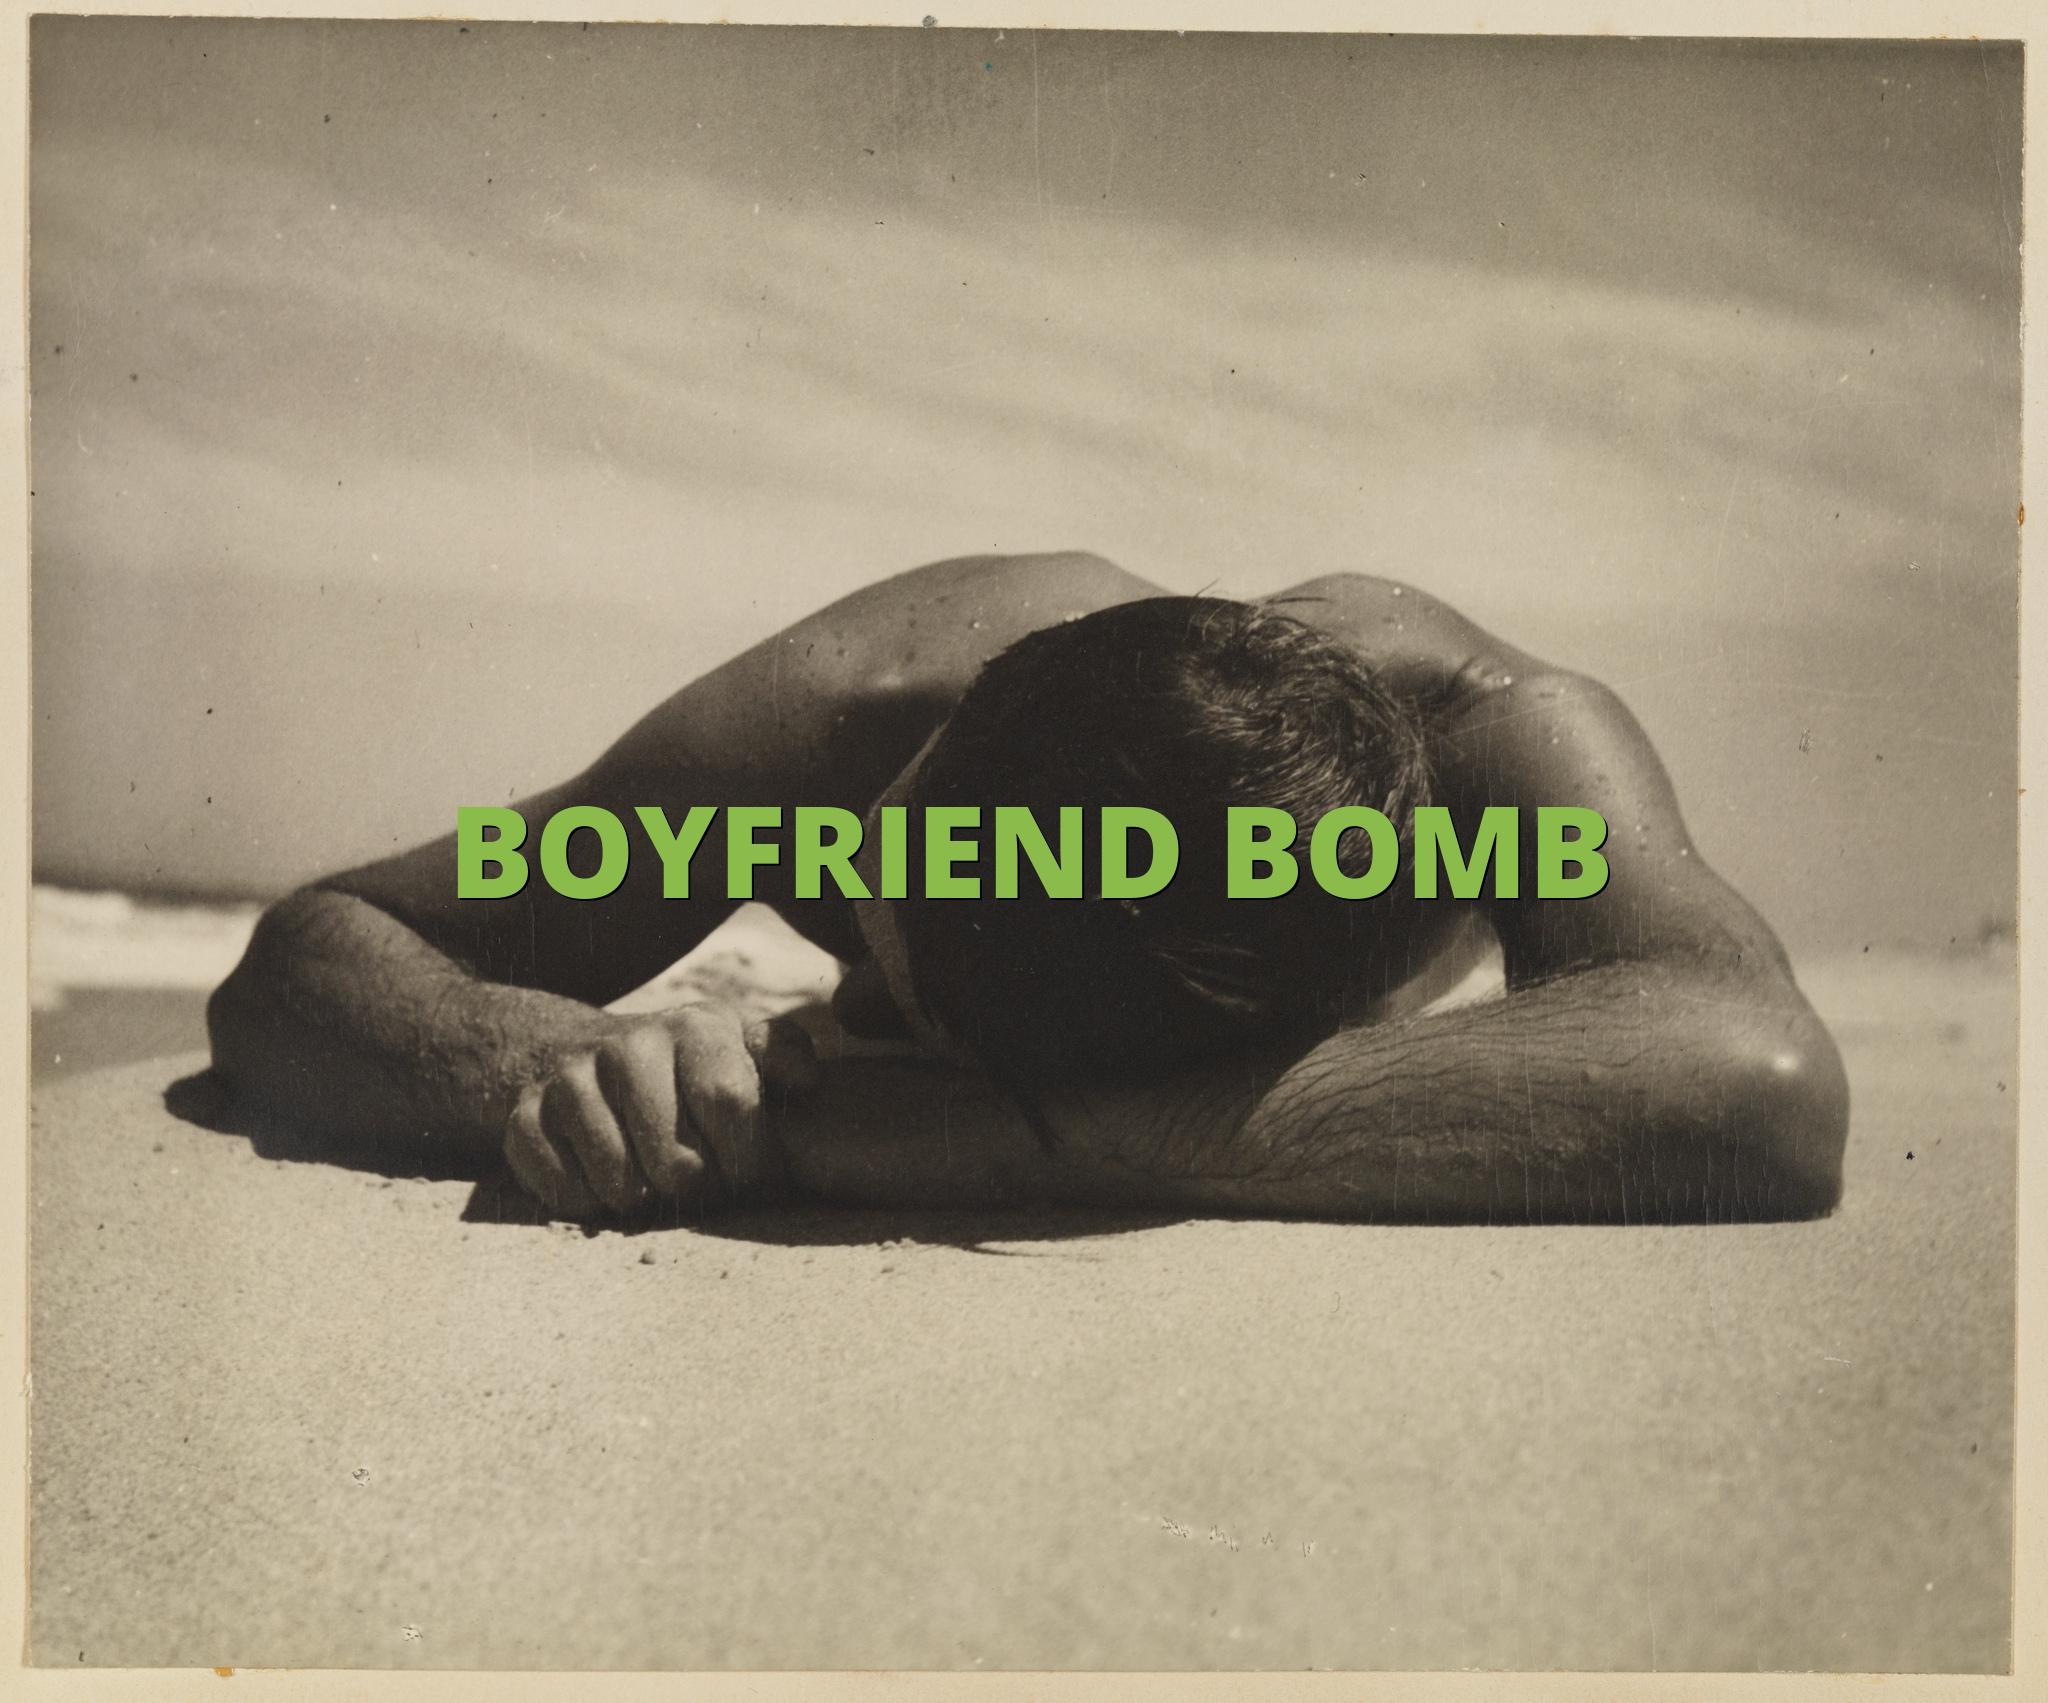 BOYFRIEND BOMB